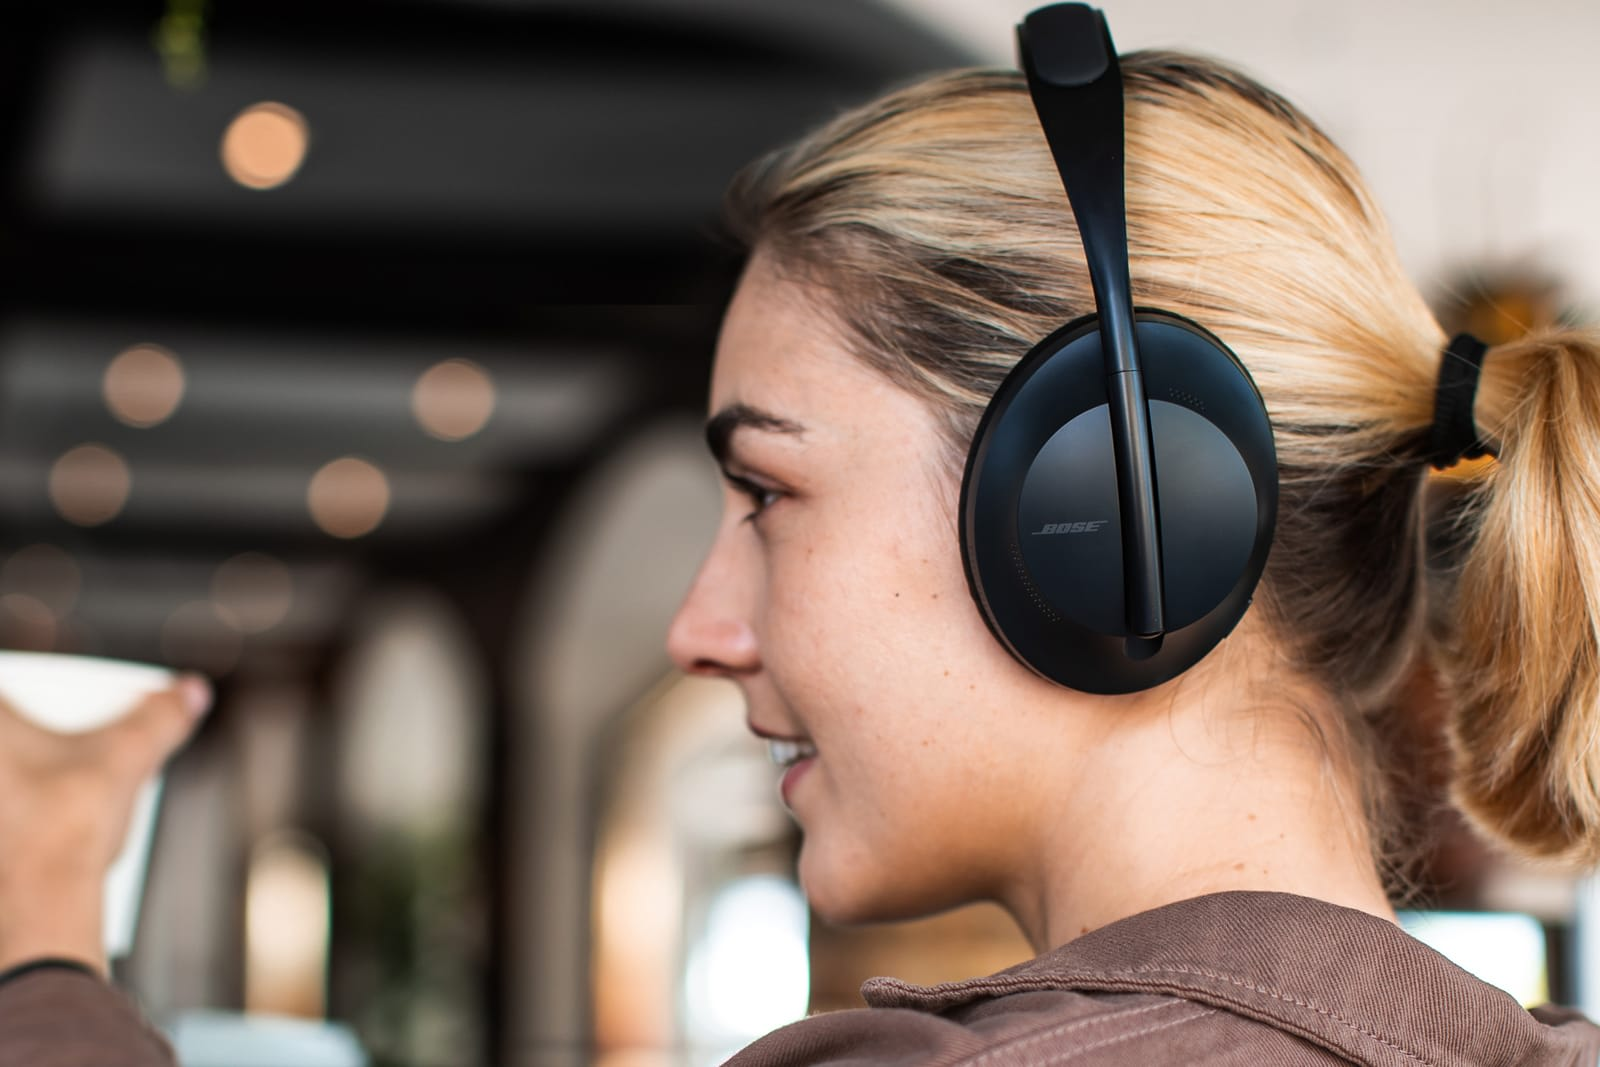 e28c2690ab0 The successor to Bose's QC35 noise-cancelling headphones arrives June 30th